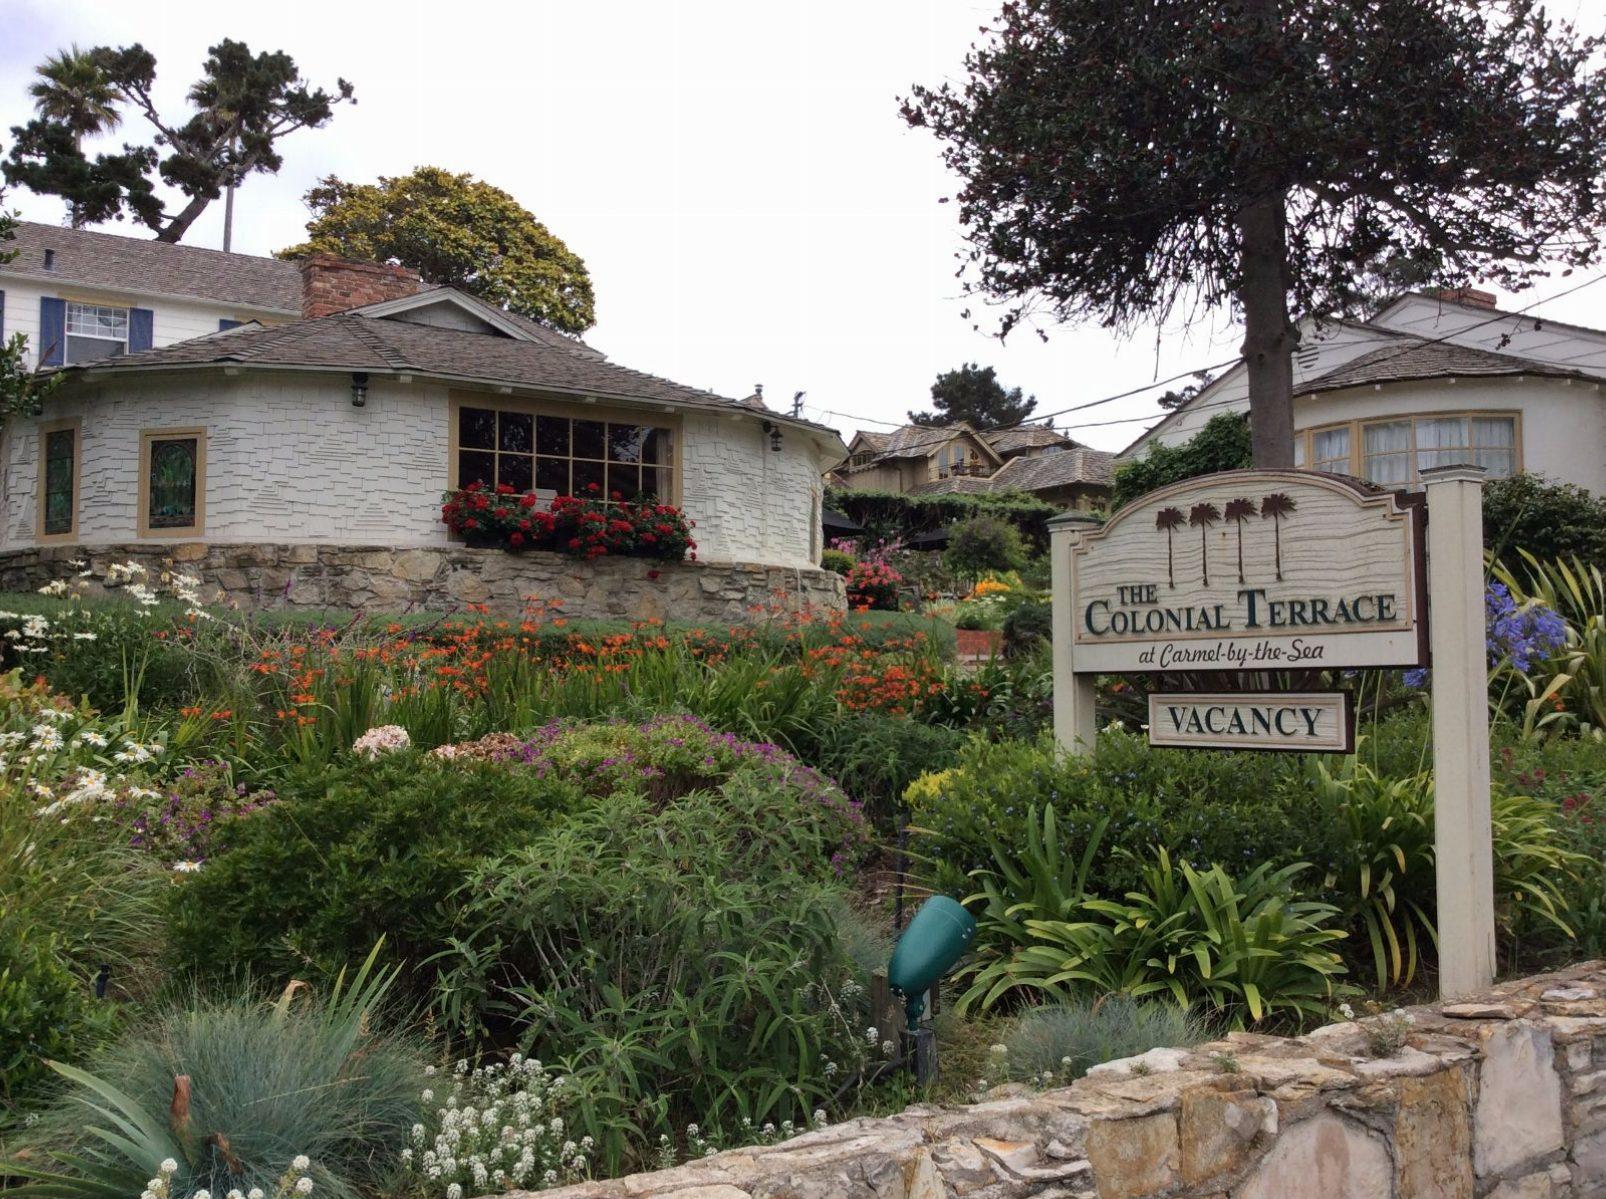 The Colonial Terrace Inn Award Winning Garden on San Antonio and 13th St Beach in Carmel, Ca 93921